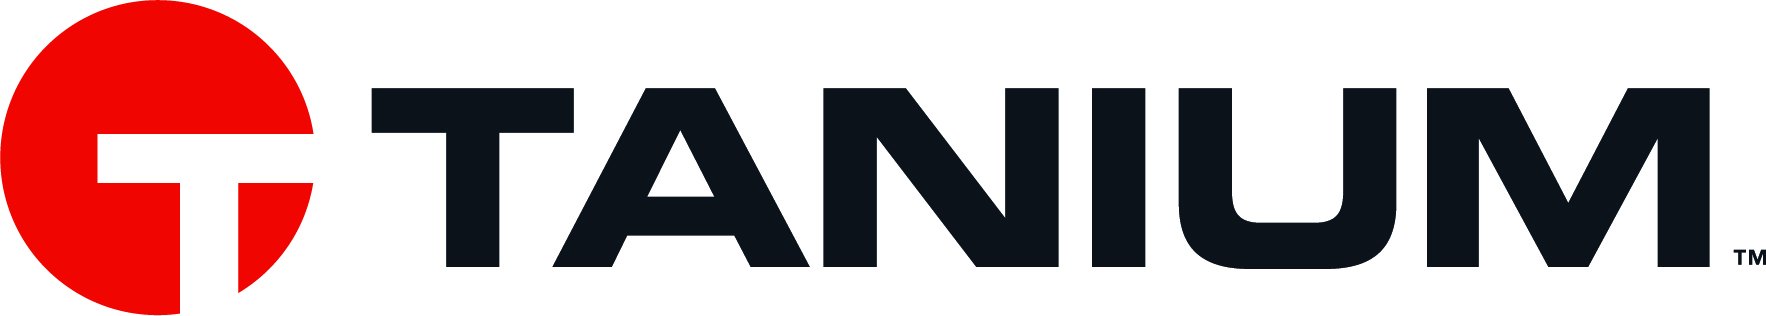 Tanium-Logo-FullColor-Positive.jpg